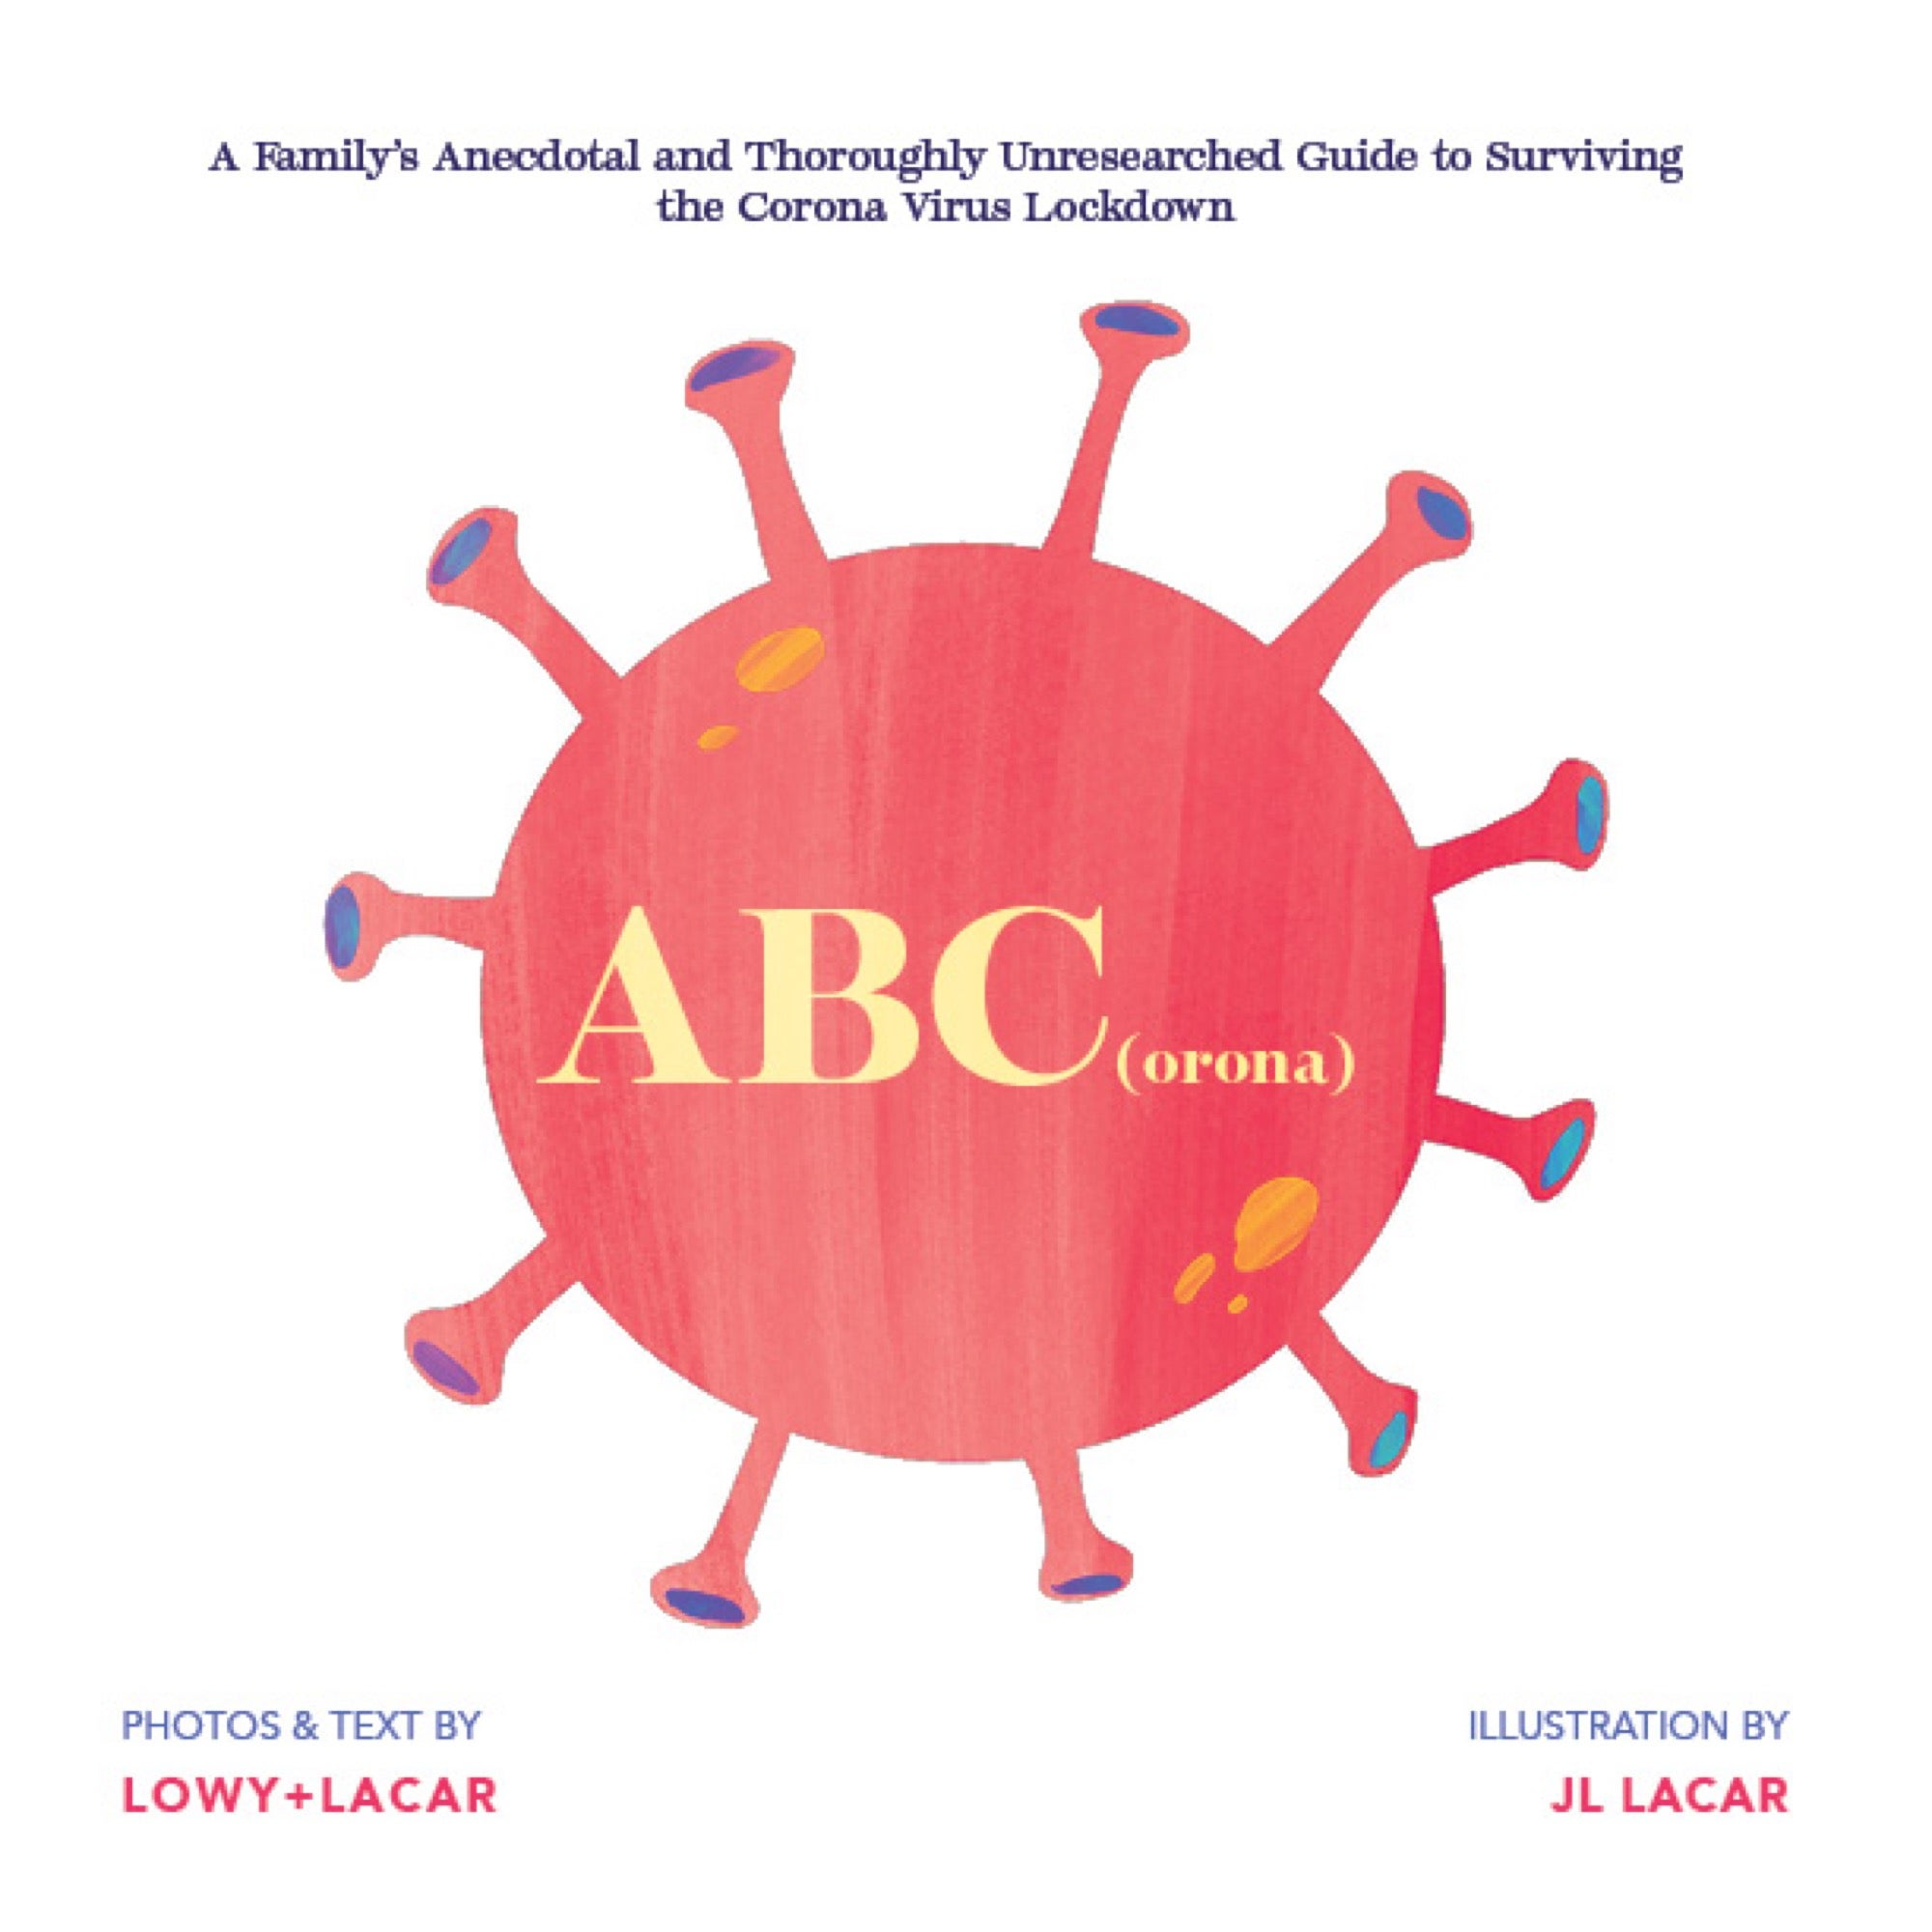 Alpha-Universe-Lacar-and-Lowy-20200420_ABCorona_Spread.jpg